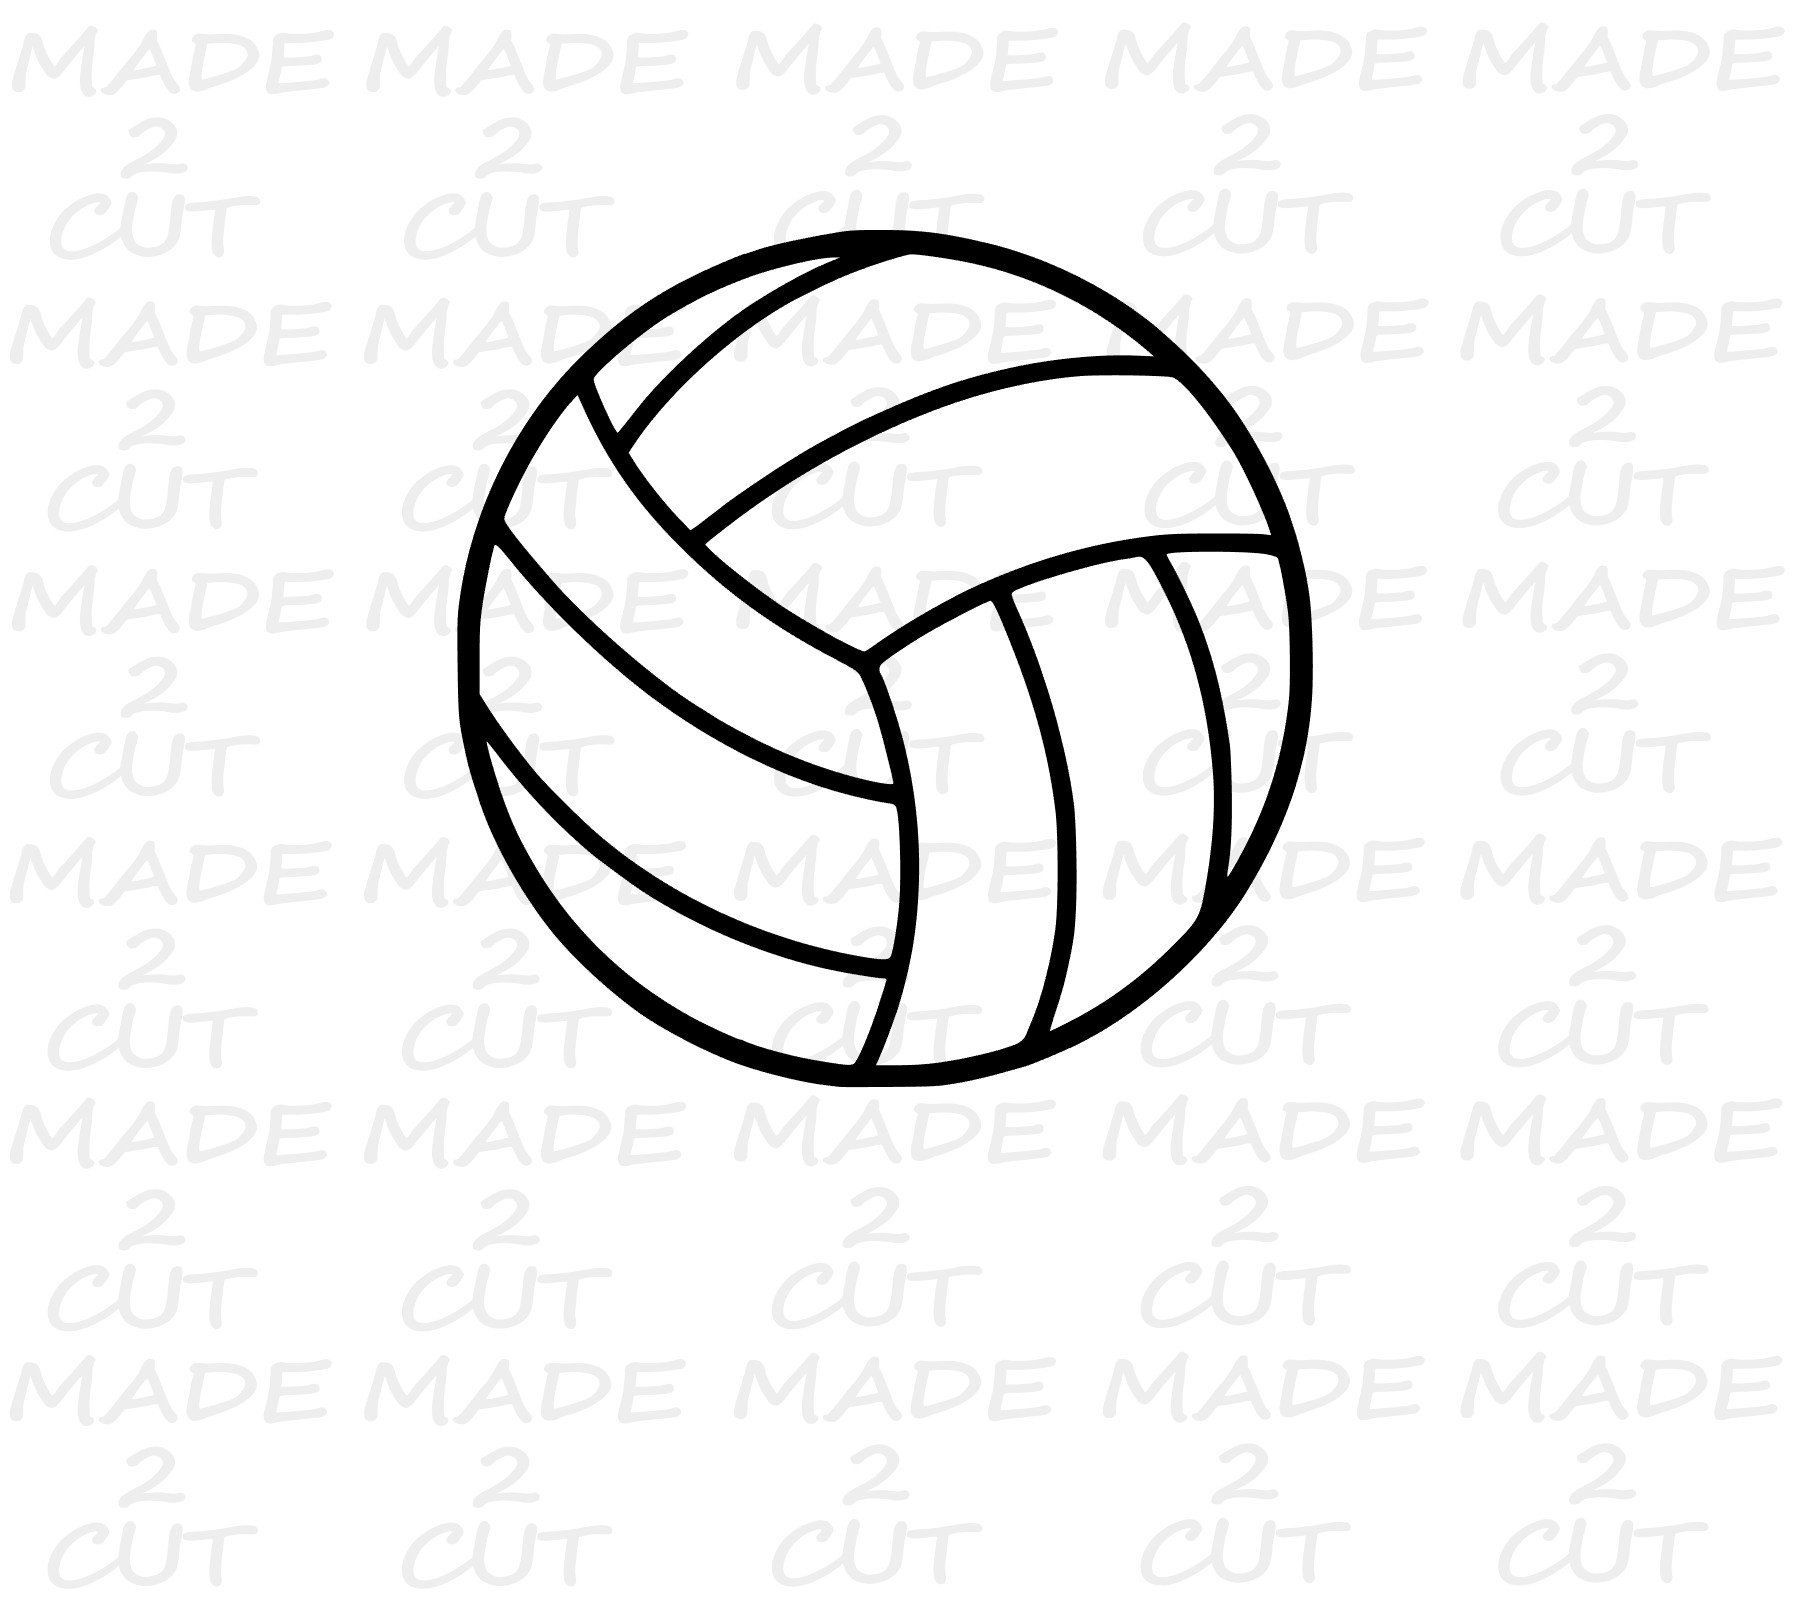 Volleyball Svg Volleyball Design Sport Svg Vball Design Etsy In 2020 Volleyball Designs Sports Svg Svg